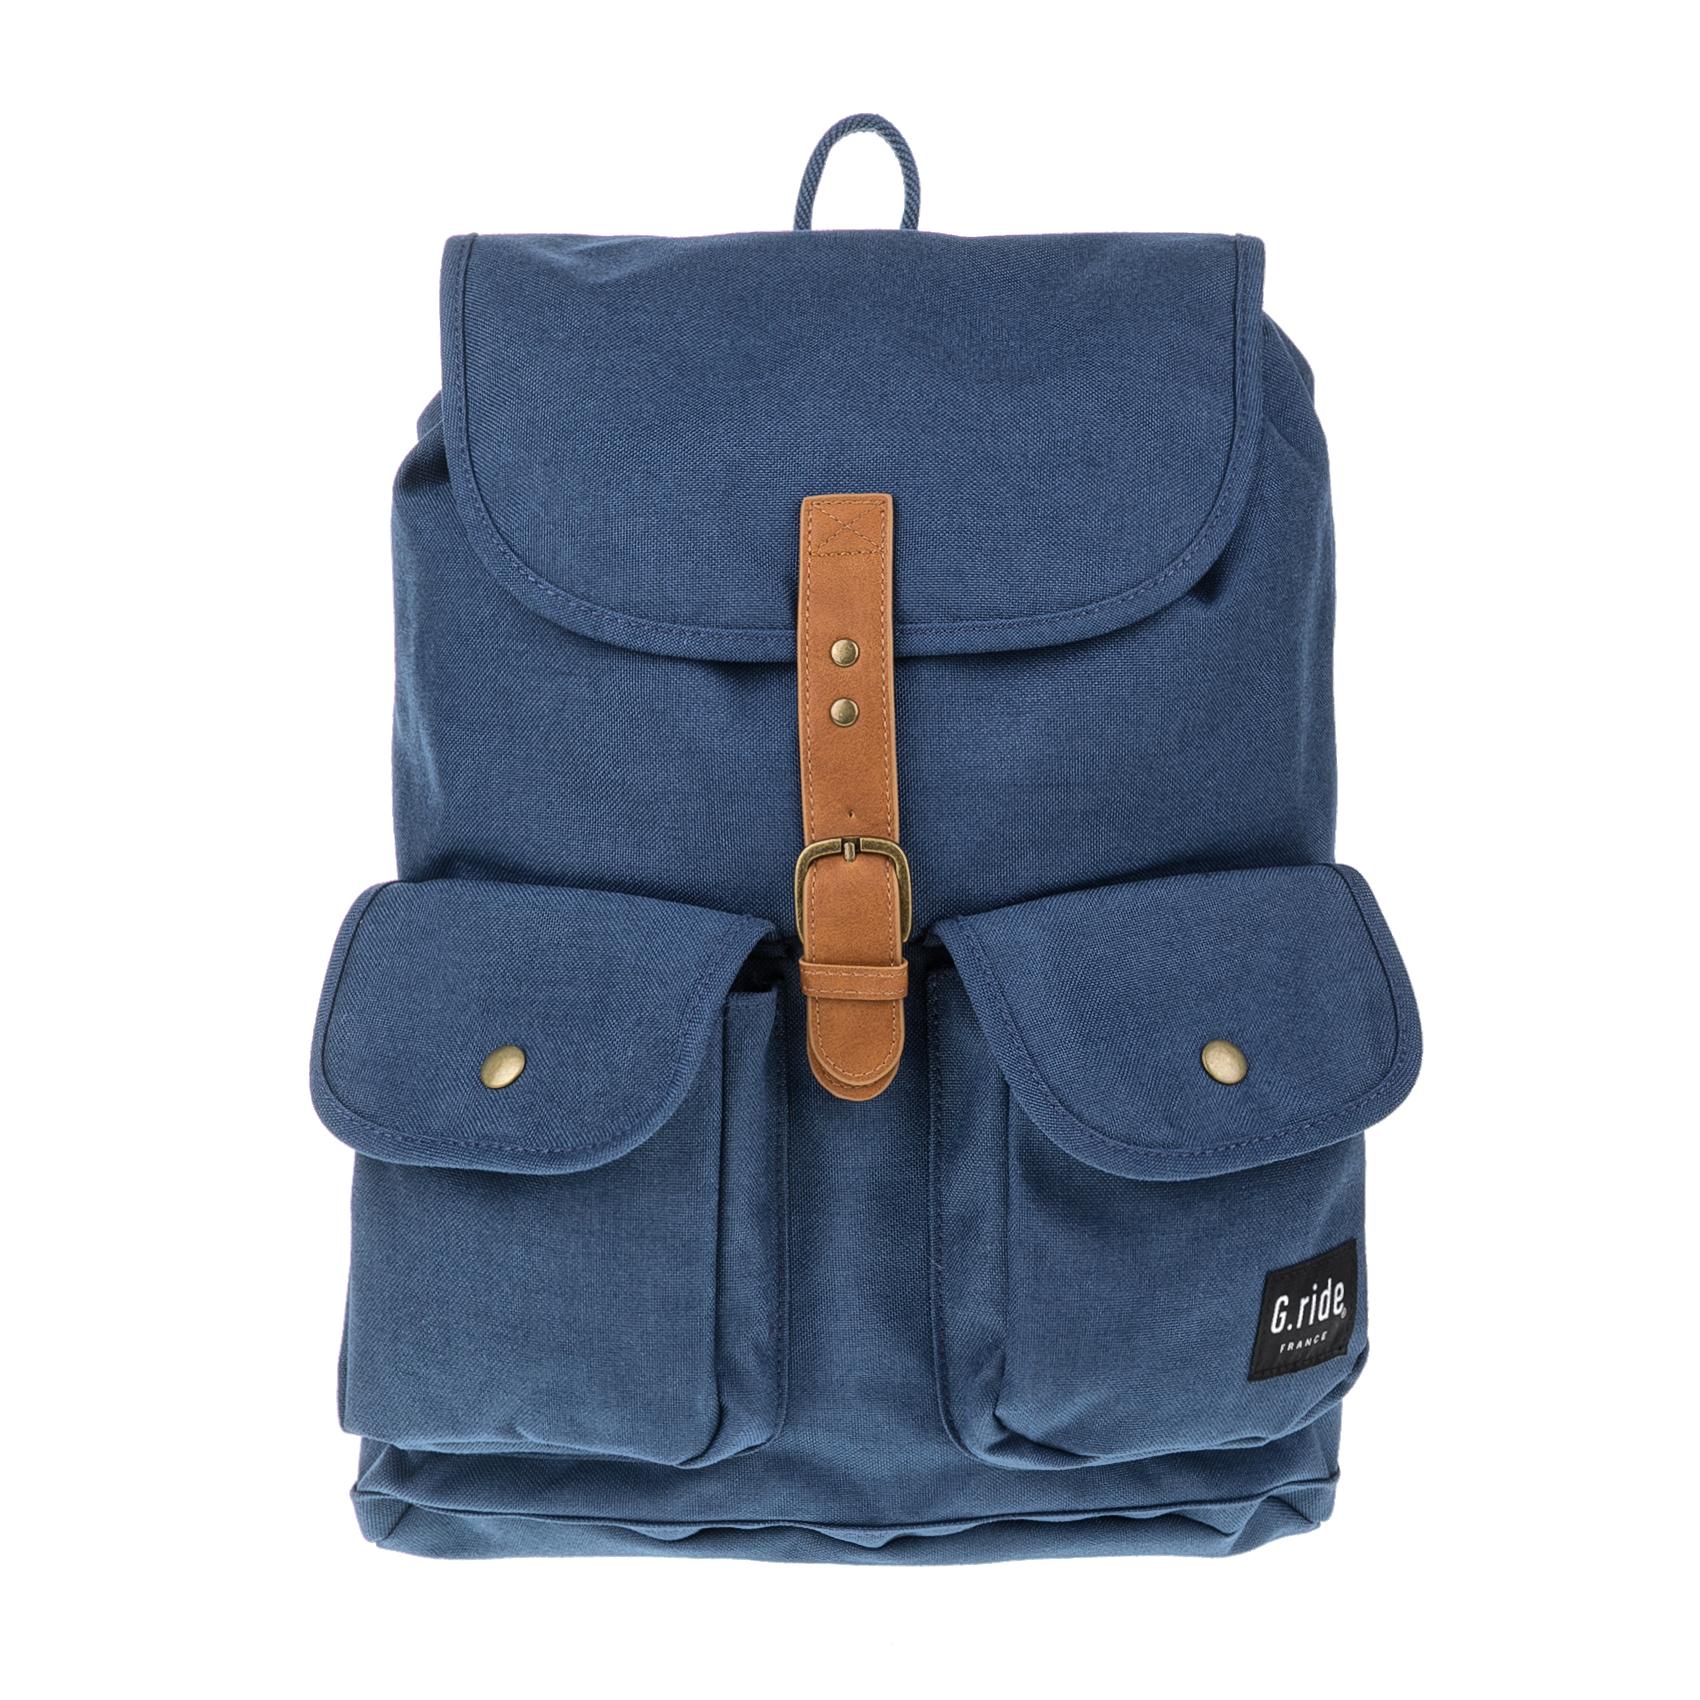 G.RIDE – Τσάντα πλάτης CHLOE μπλε 1641746.0-1600